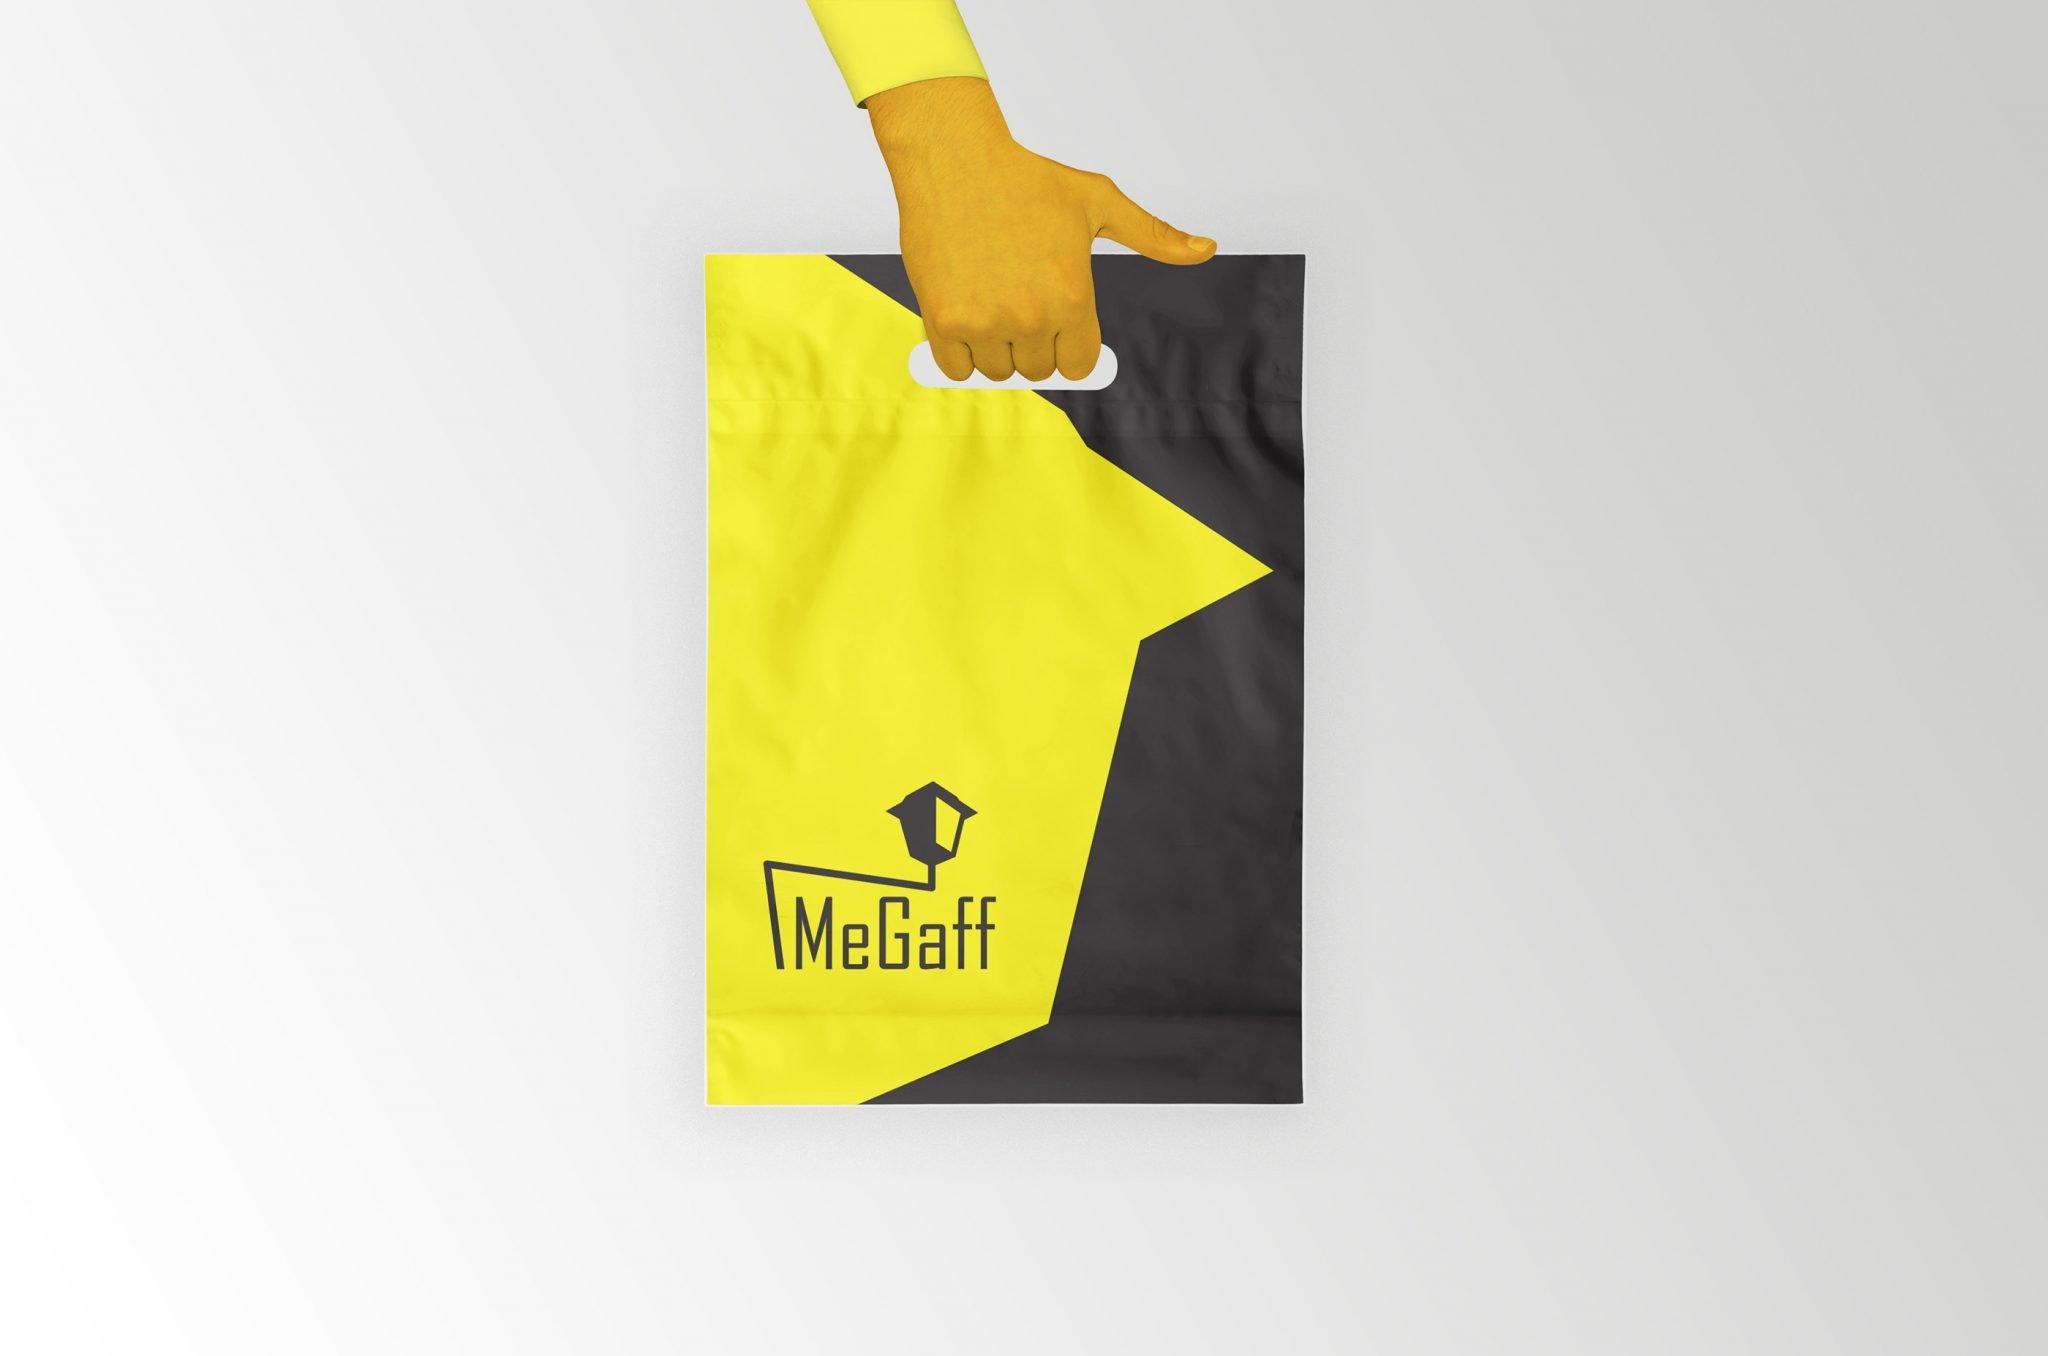 megaff-branding-design-2